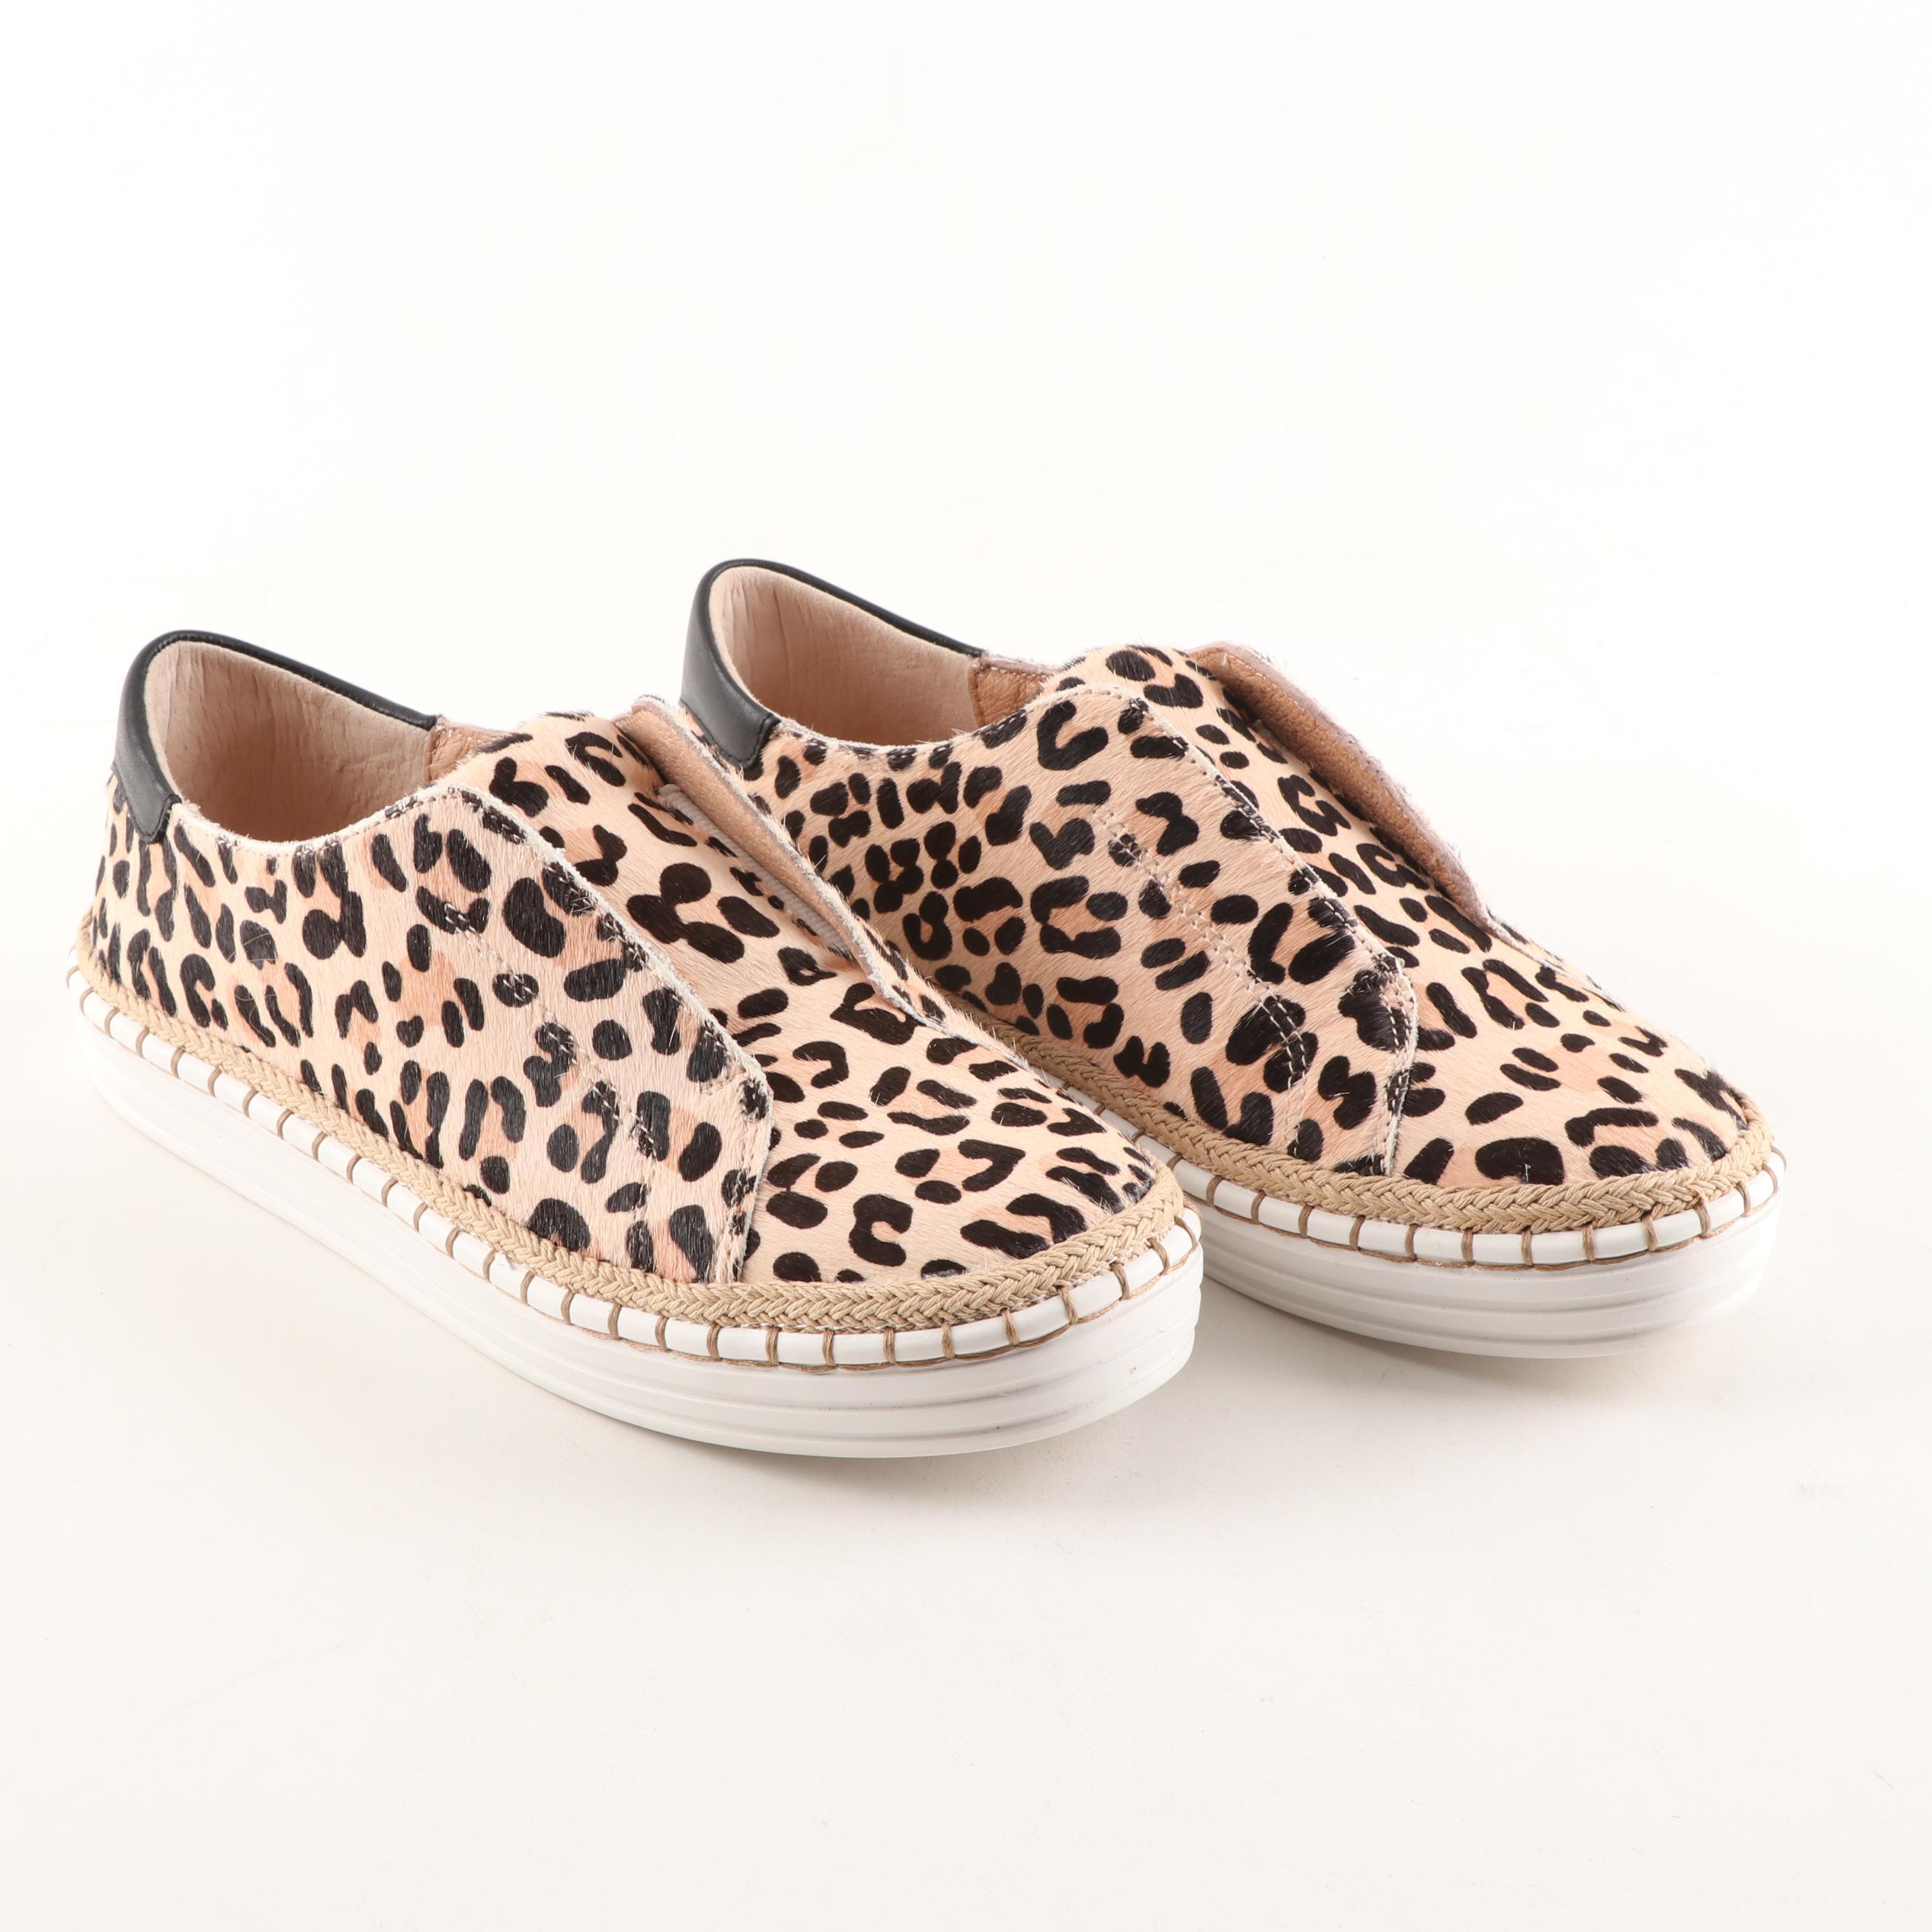 J/Slides Leopard Pony Leather Karla